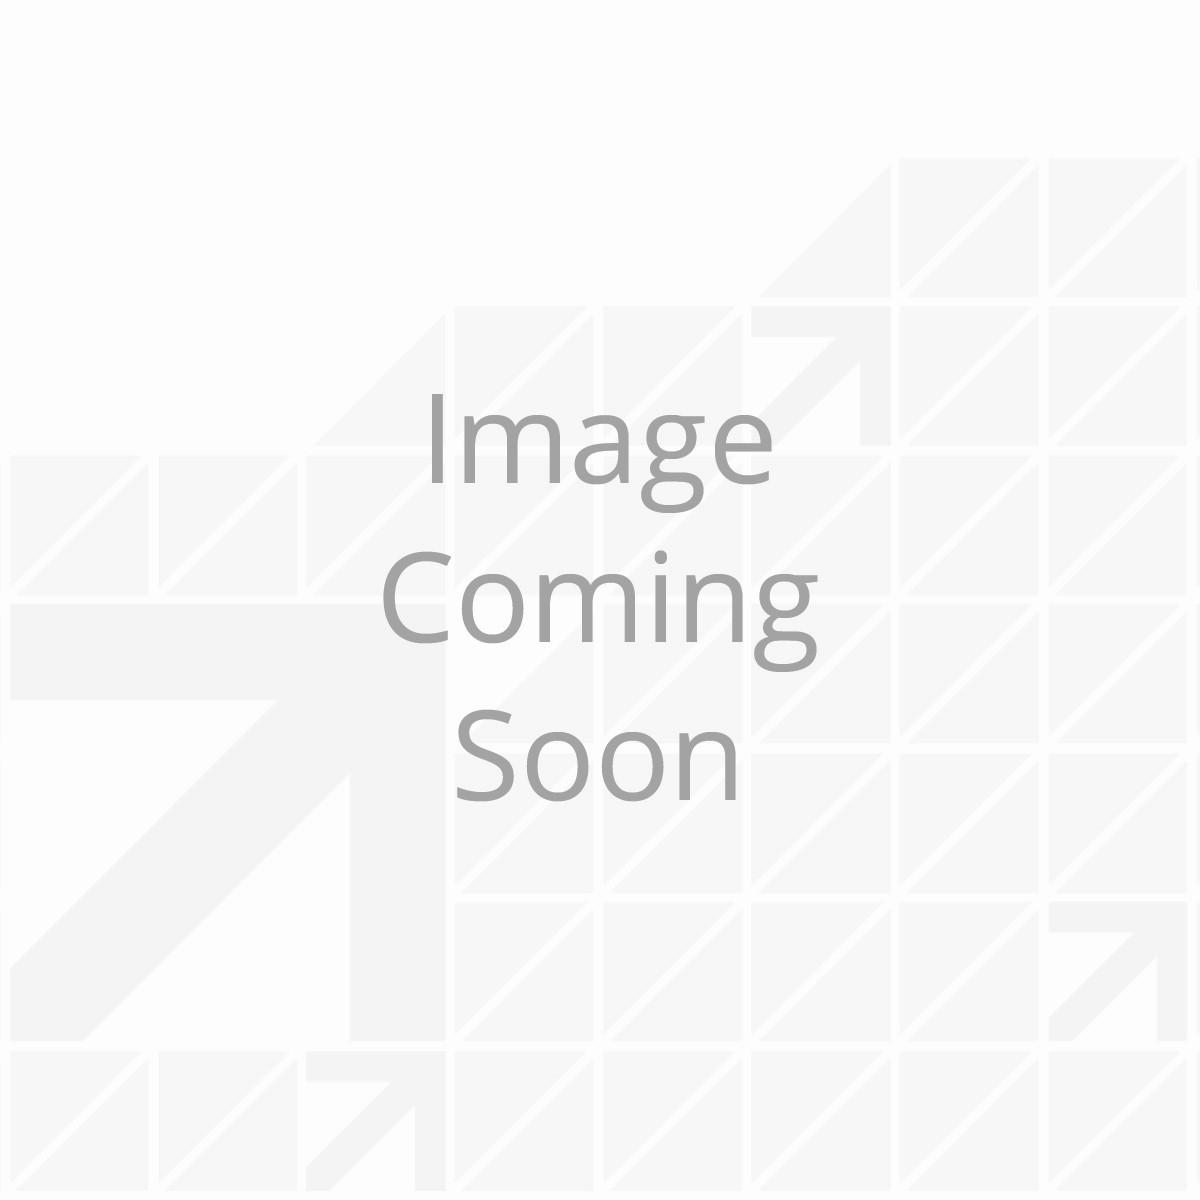 Inner Bearing Race - 3,500 lbs. Axles